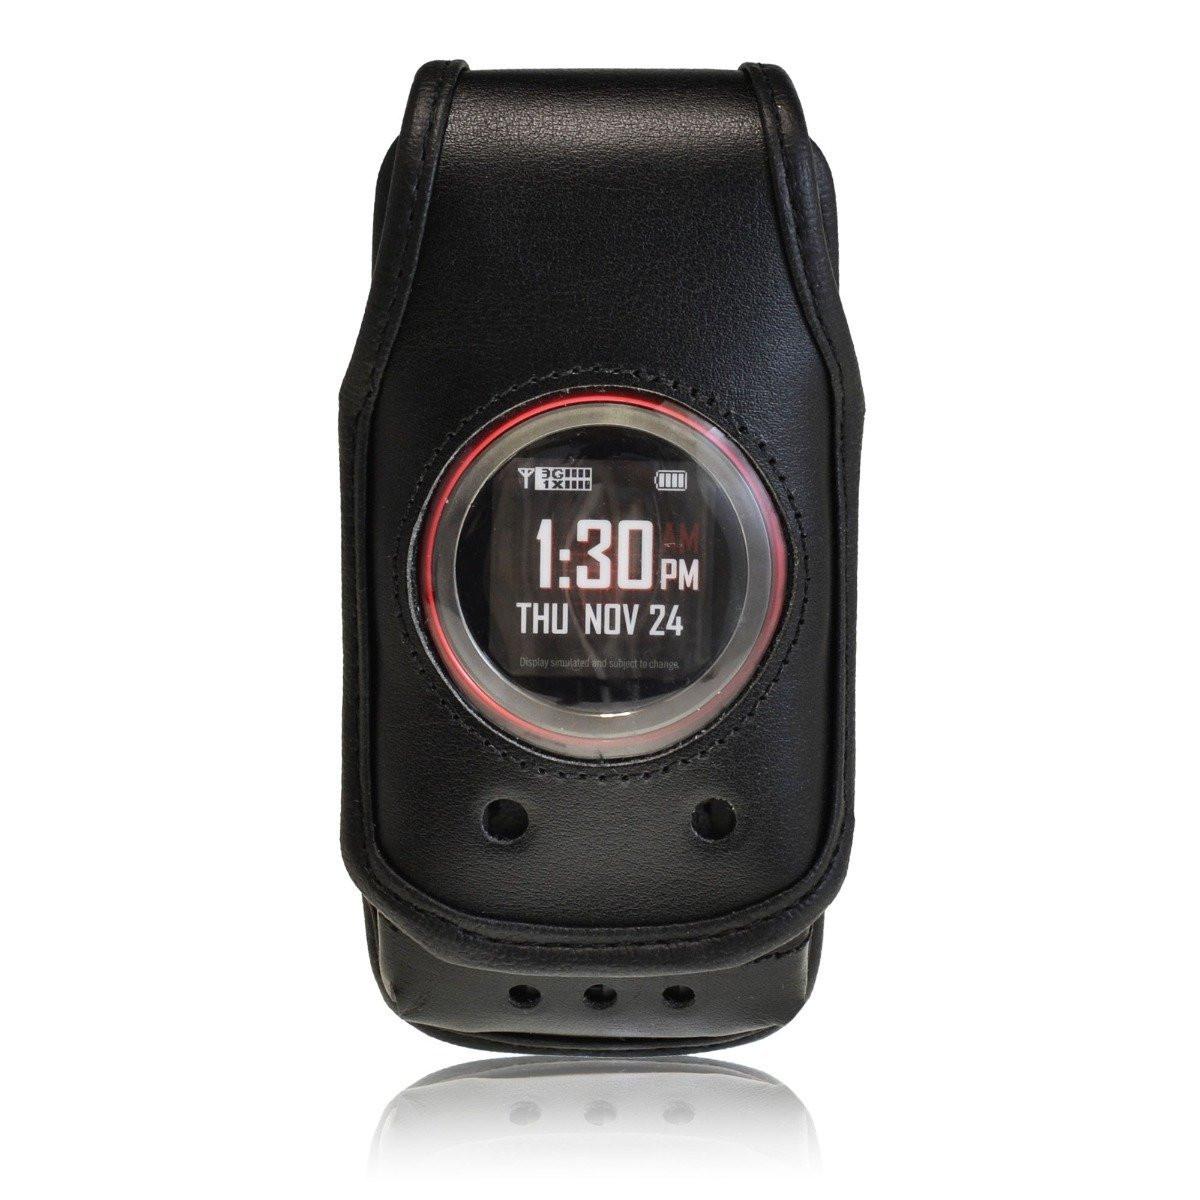 LG lg exalt phone case : ... Ravine 2 Black Leather Case with Rotating Metal Clip - Turtleback Case